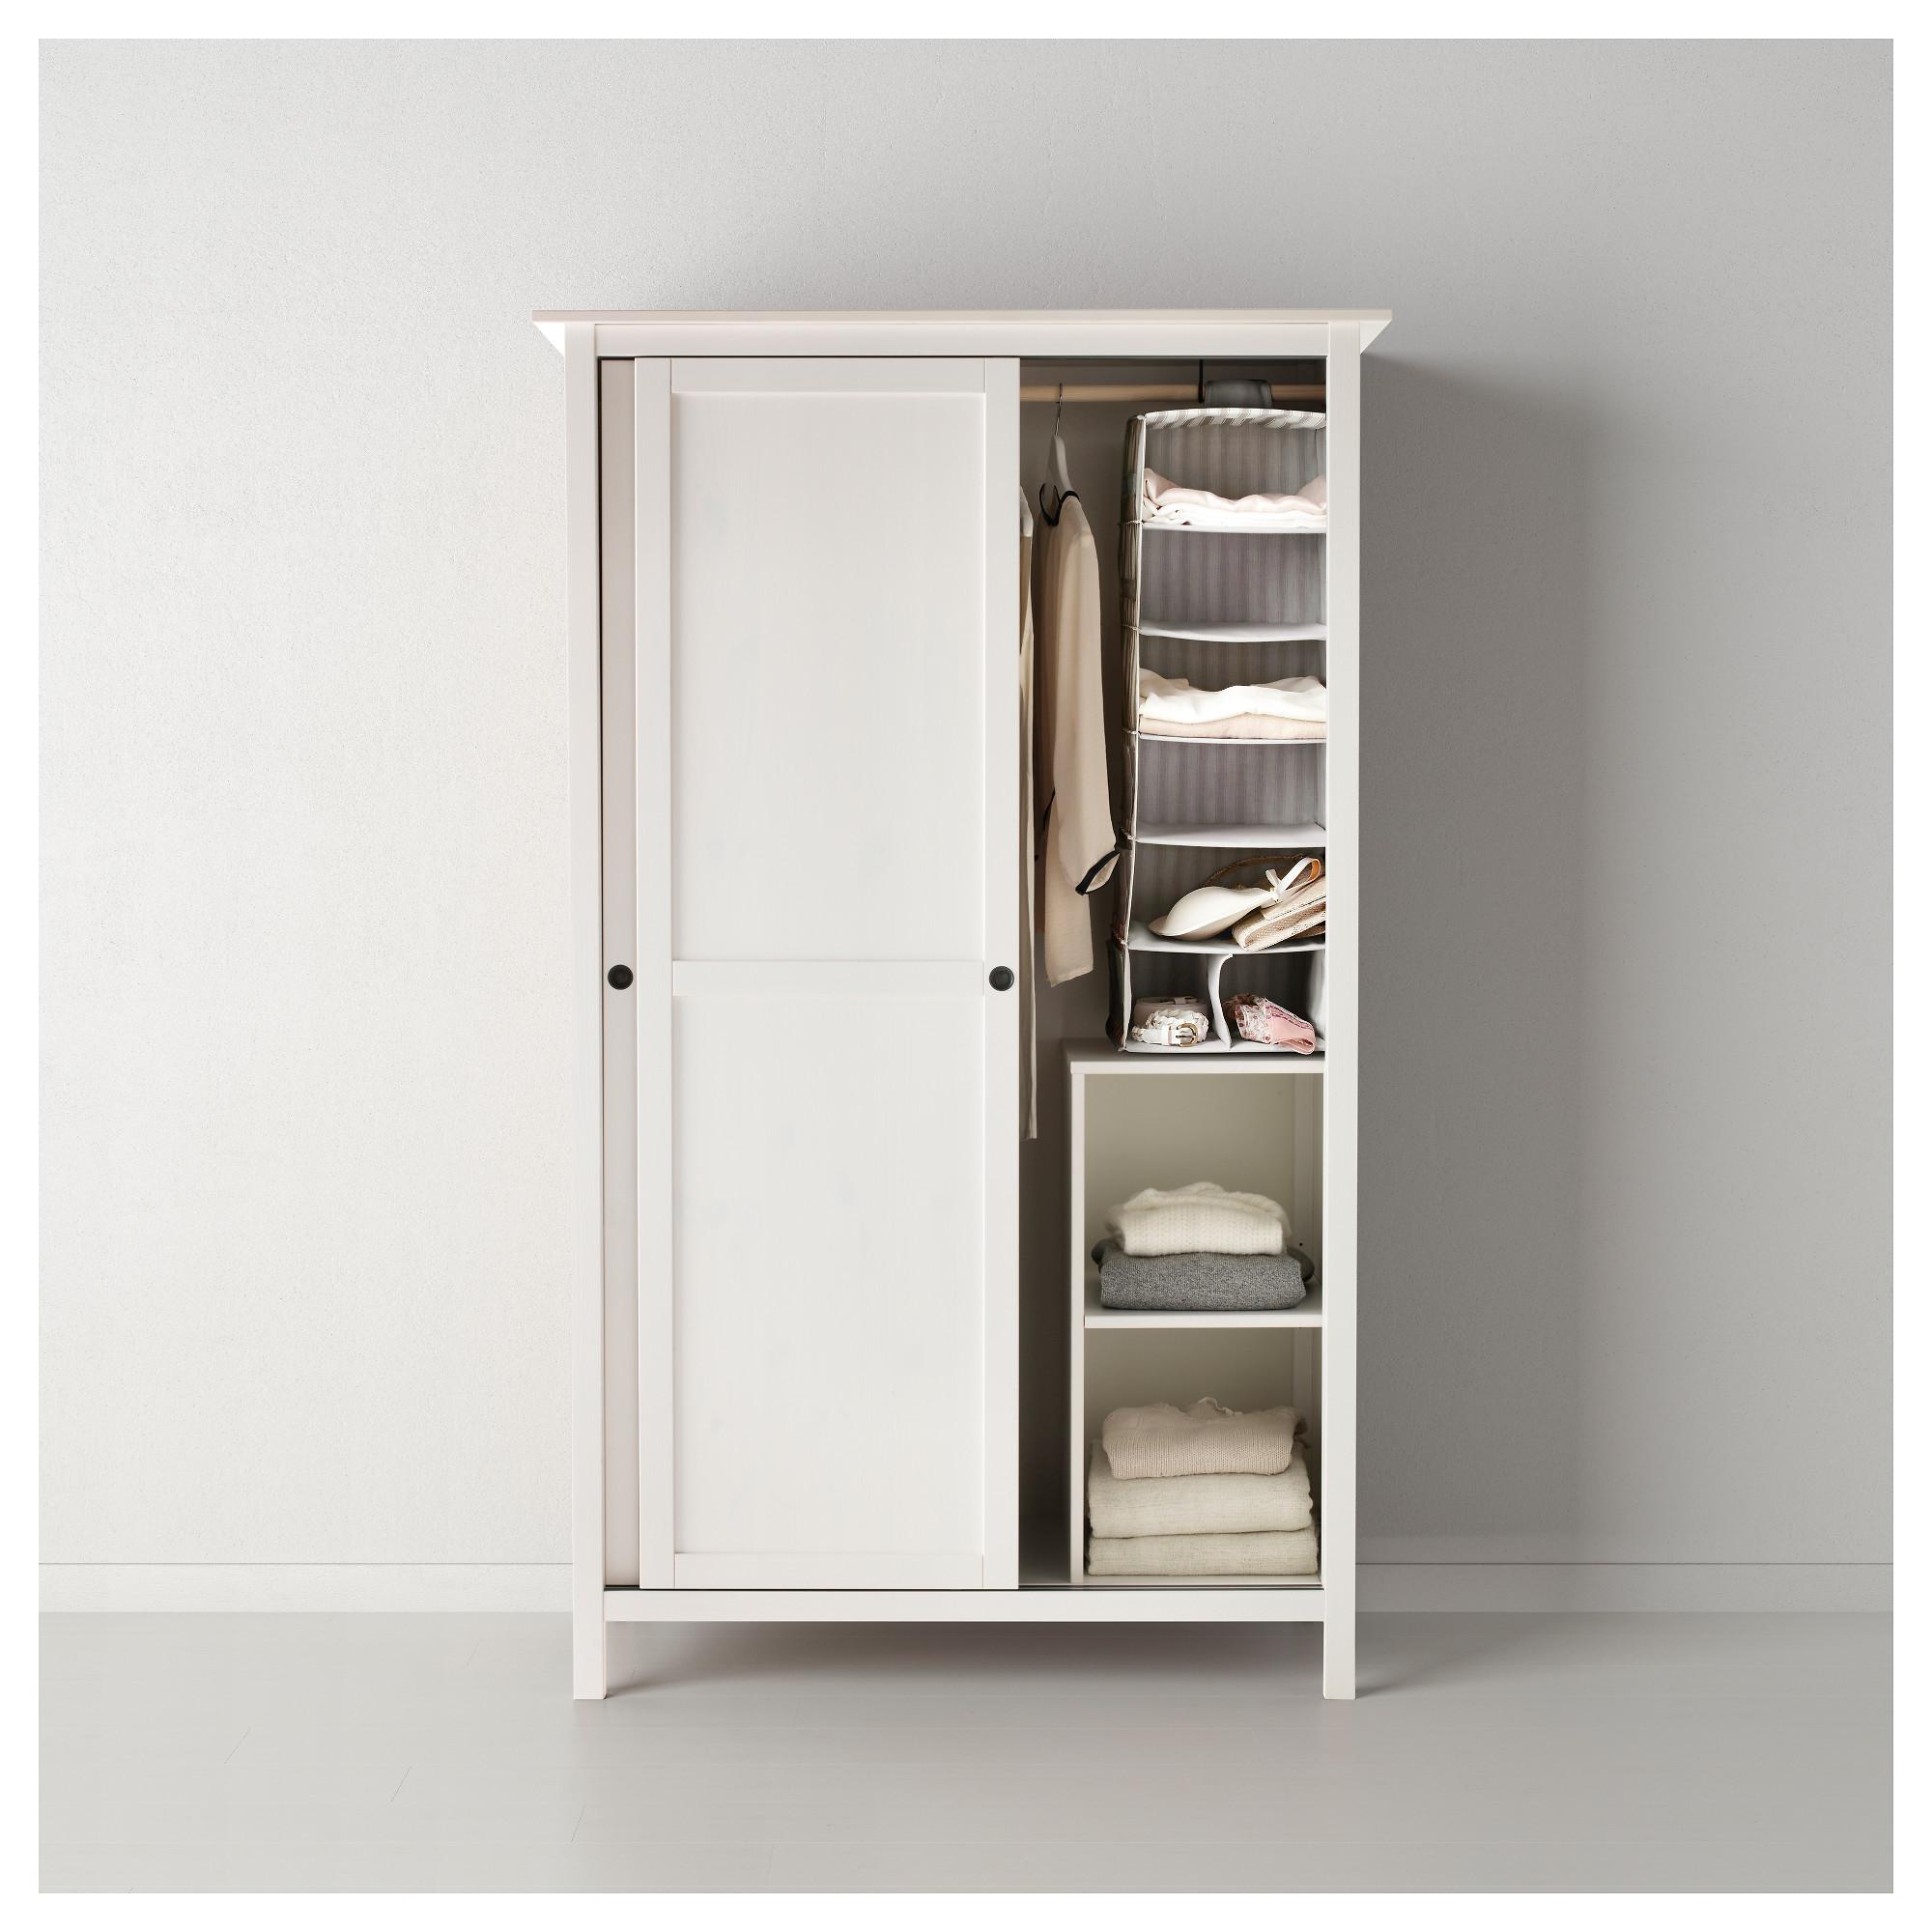 Wardrobe in sliding HEMNES White stain with 2 IKEA doors iPkXuOZ